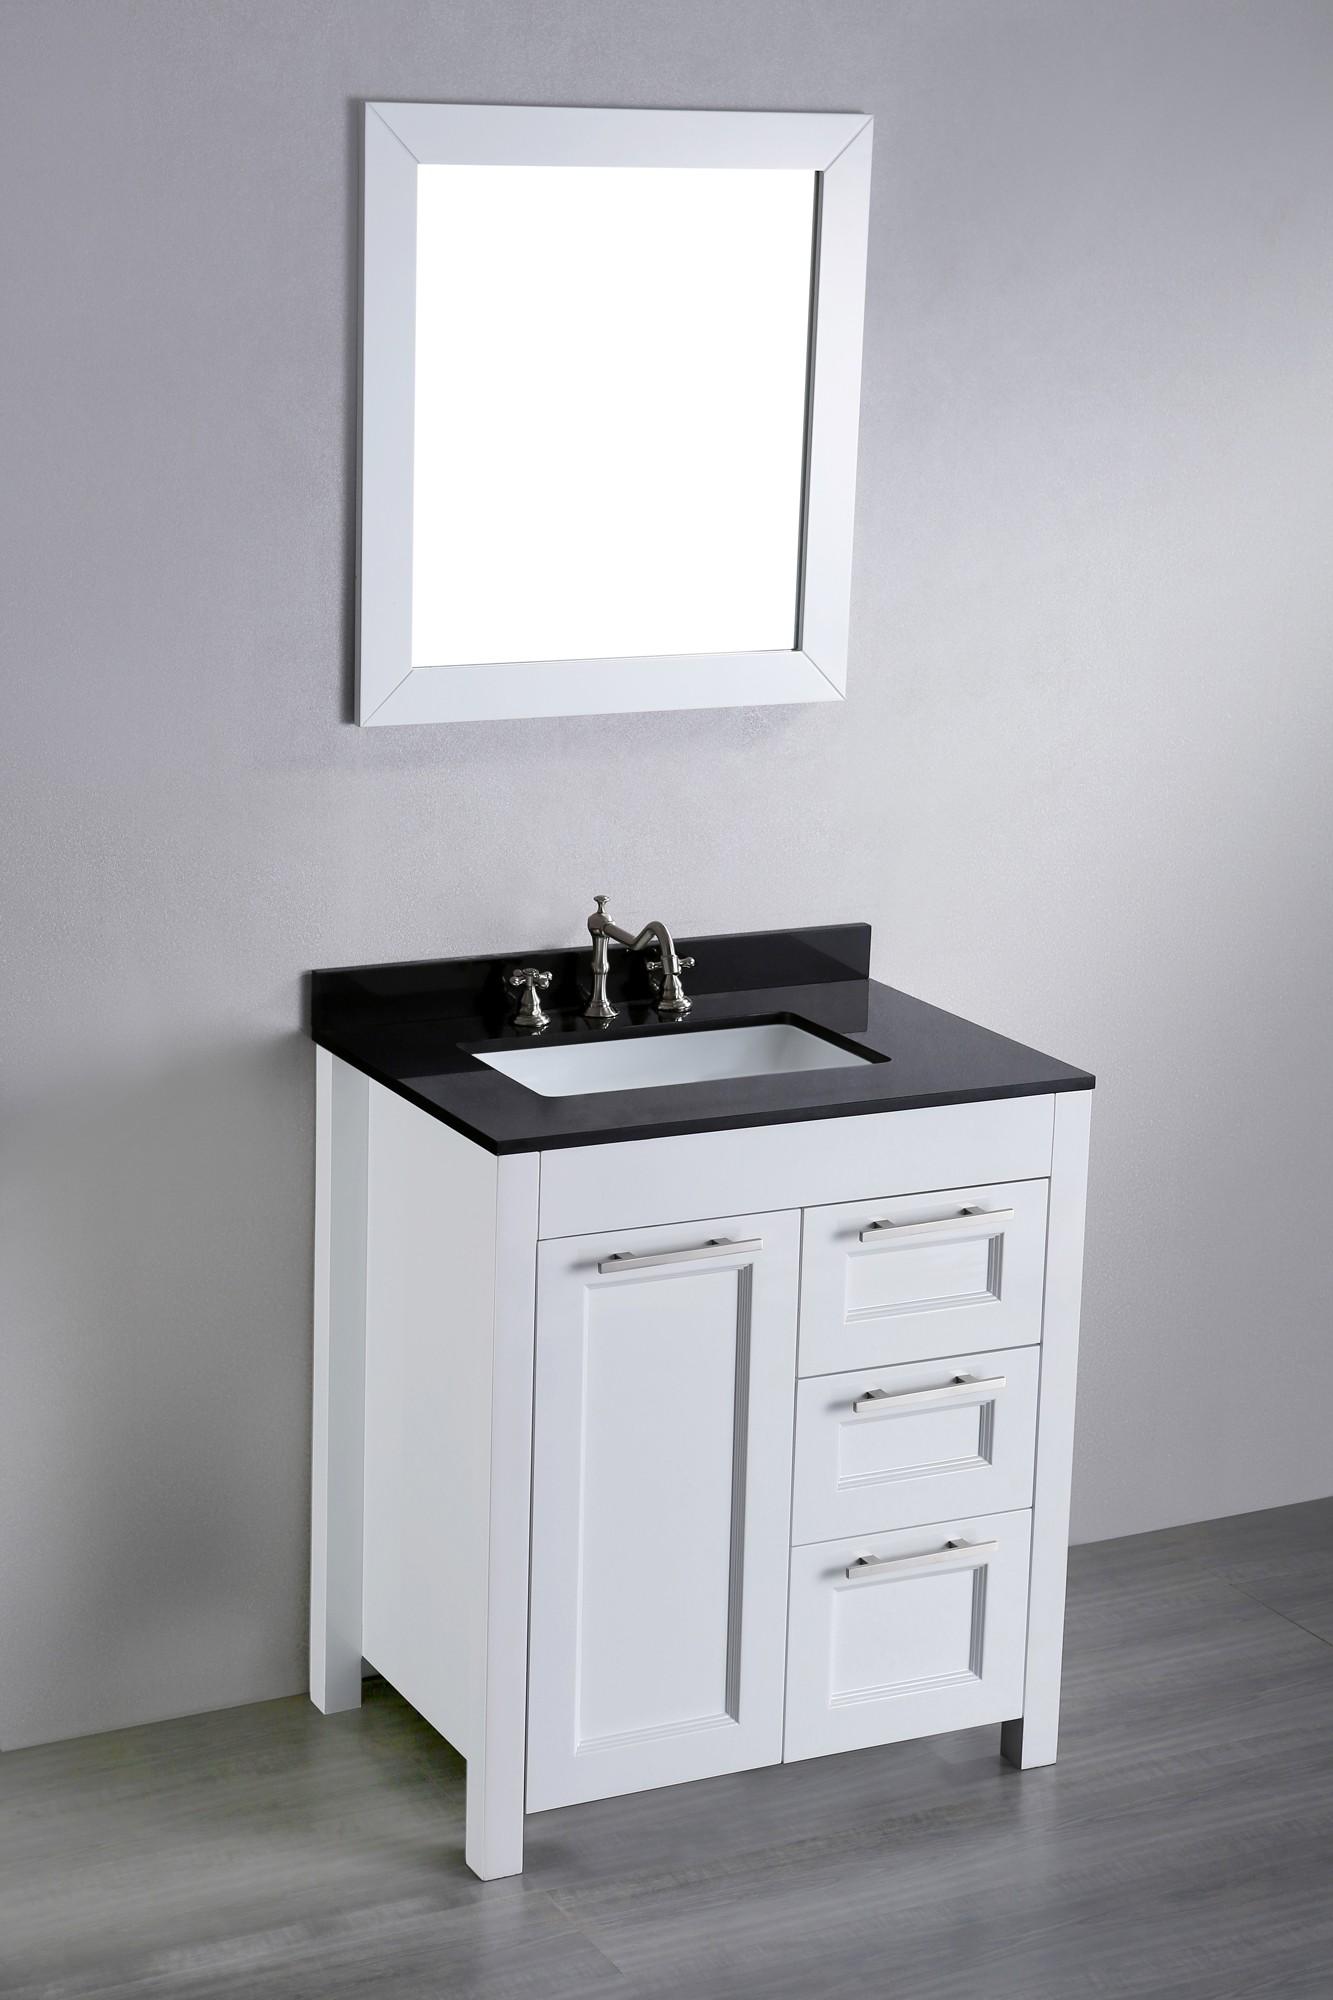 24 Inch Bathroom Sink Best Luxury Inch Bathroom Vanity with Sink In Home Remodel Ideas Portrait